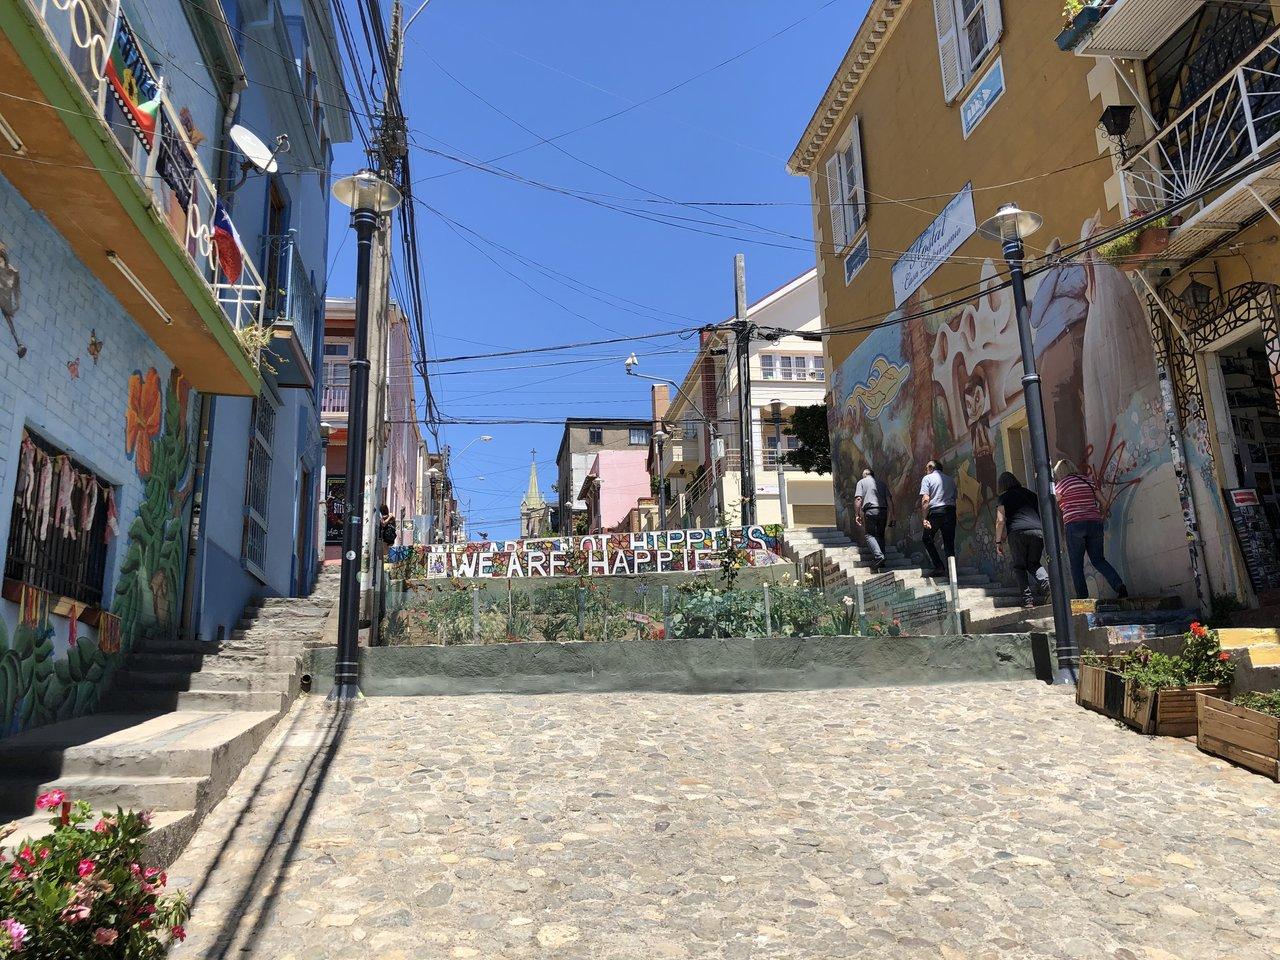 Street view of Valparaiso | Photo taken by Melody B